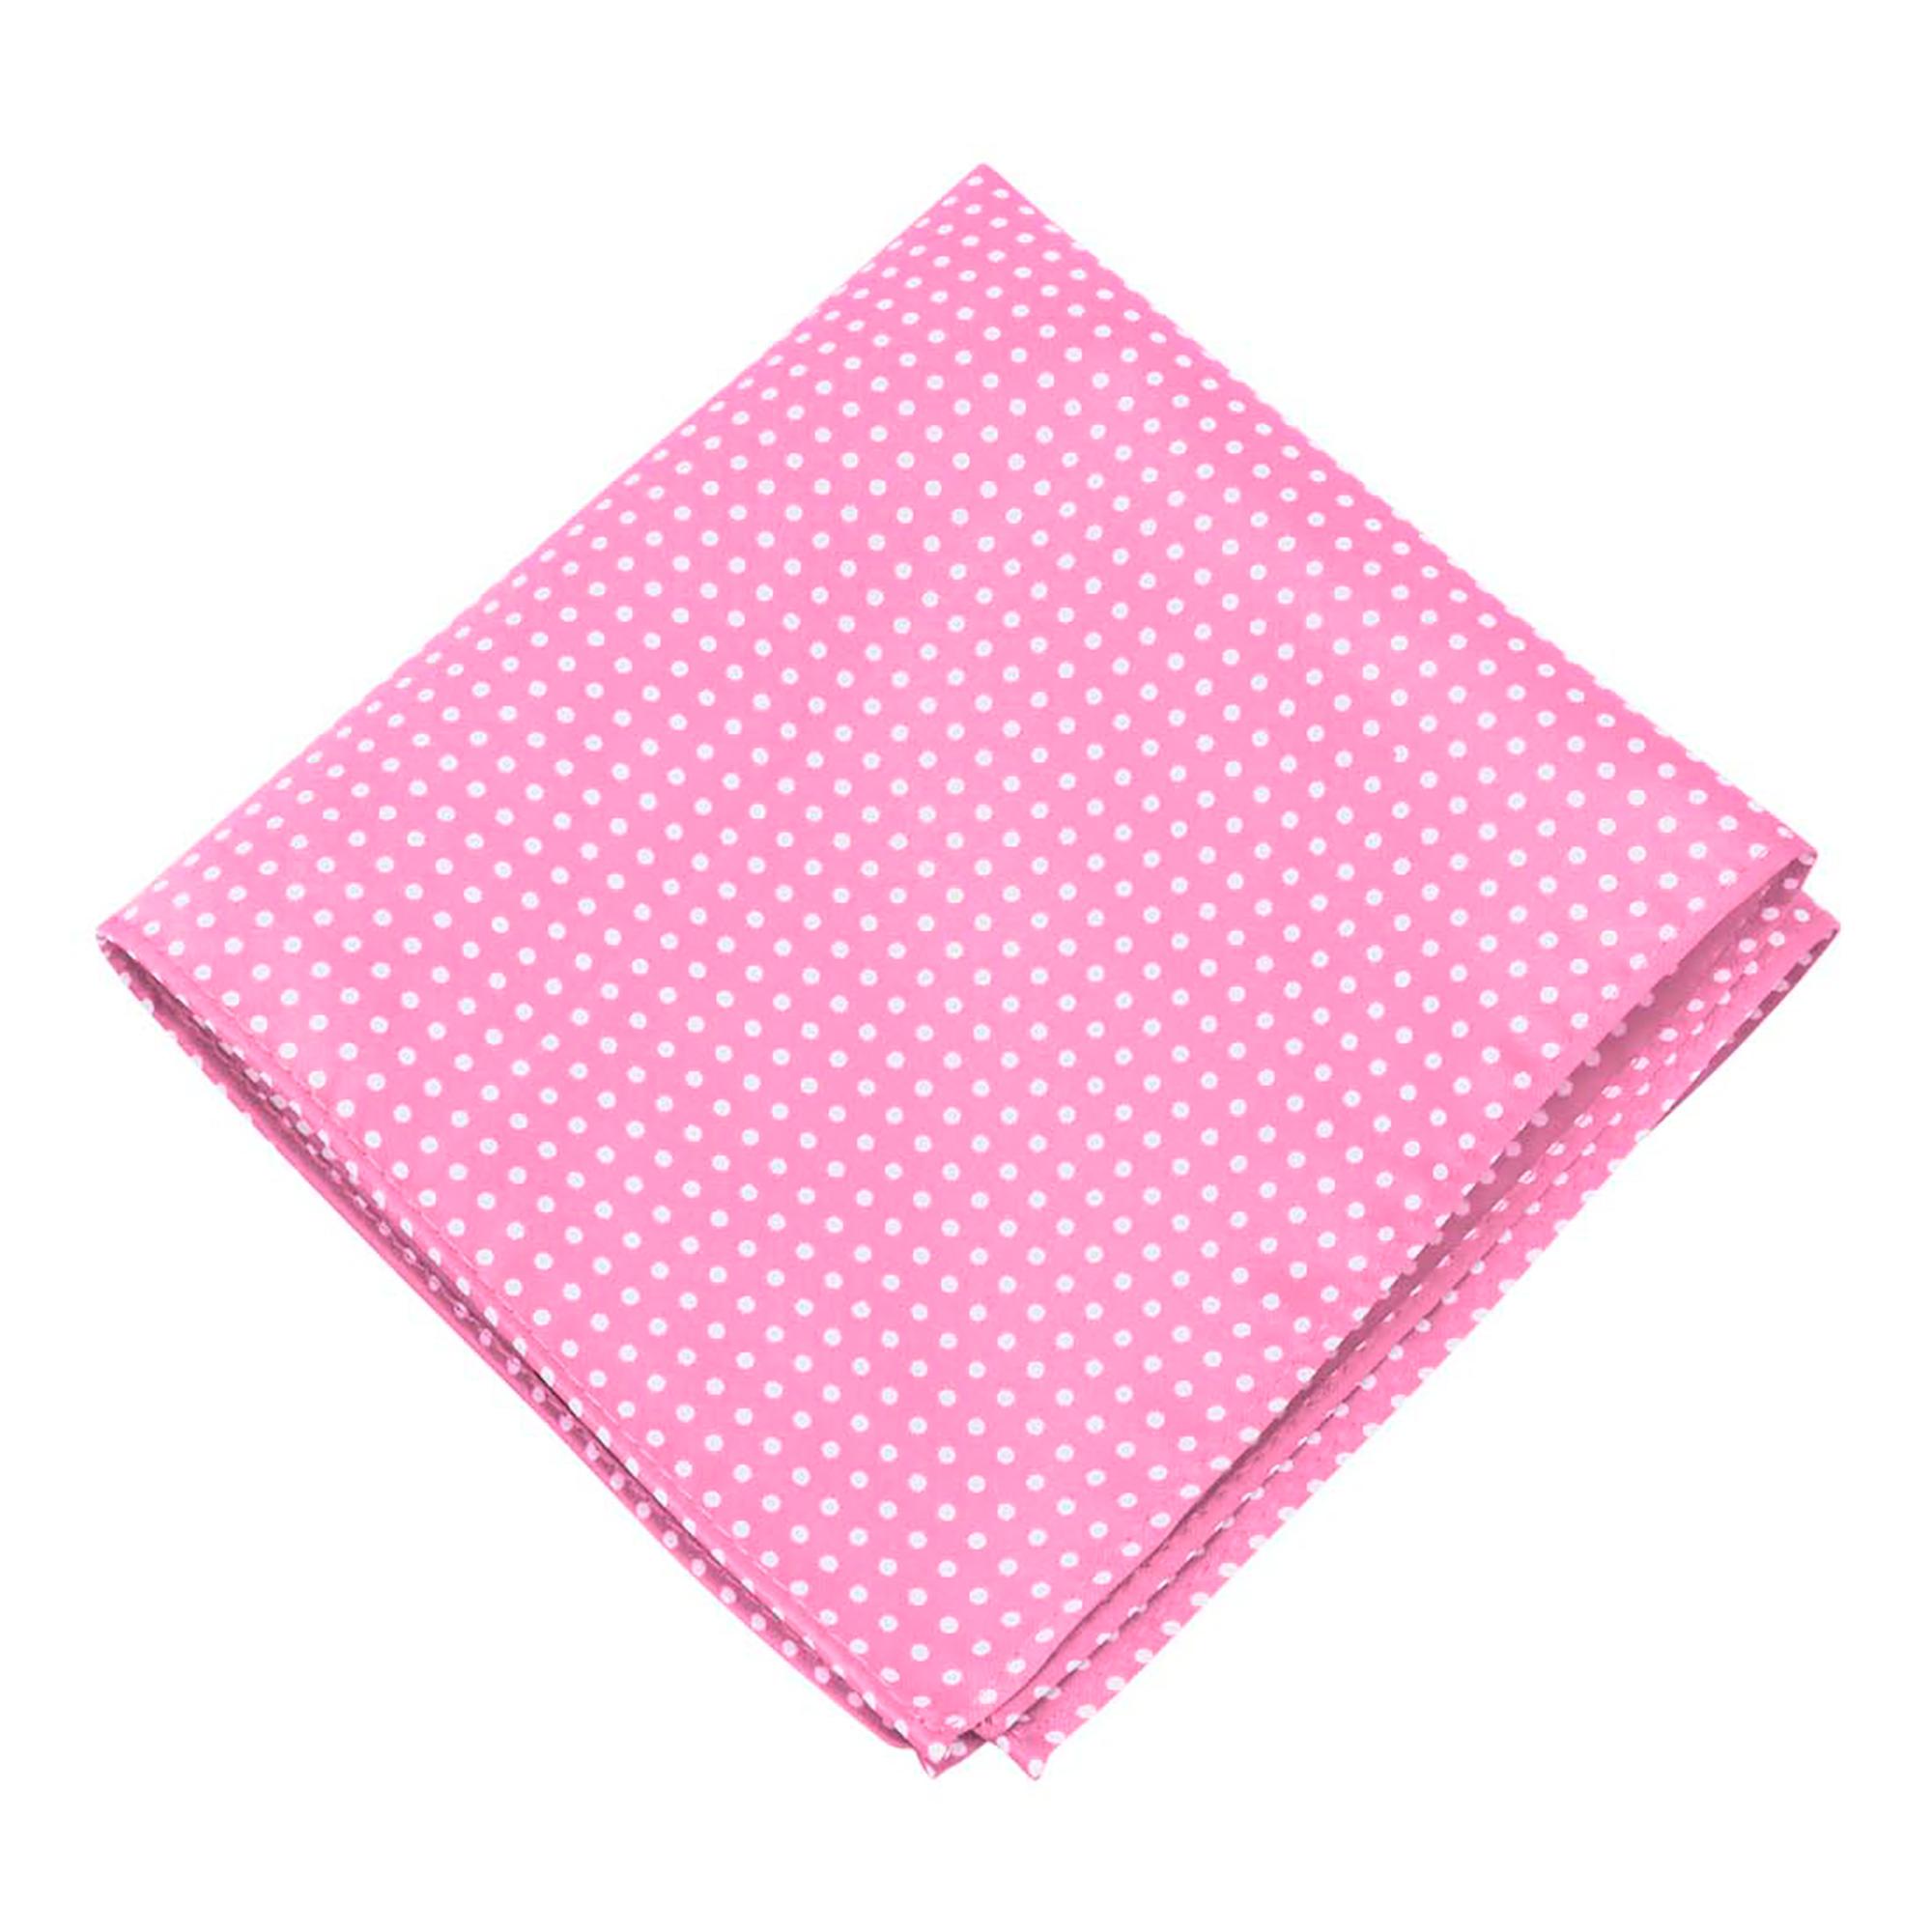 Jacob-Alexander-Matching-Polka-Dot-Suspenders-Handkerchief-and-Bow-Tie thumbnail 106